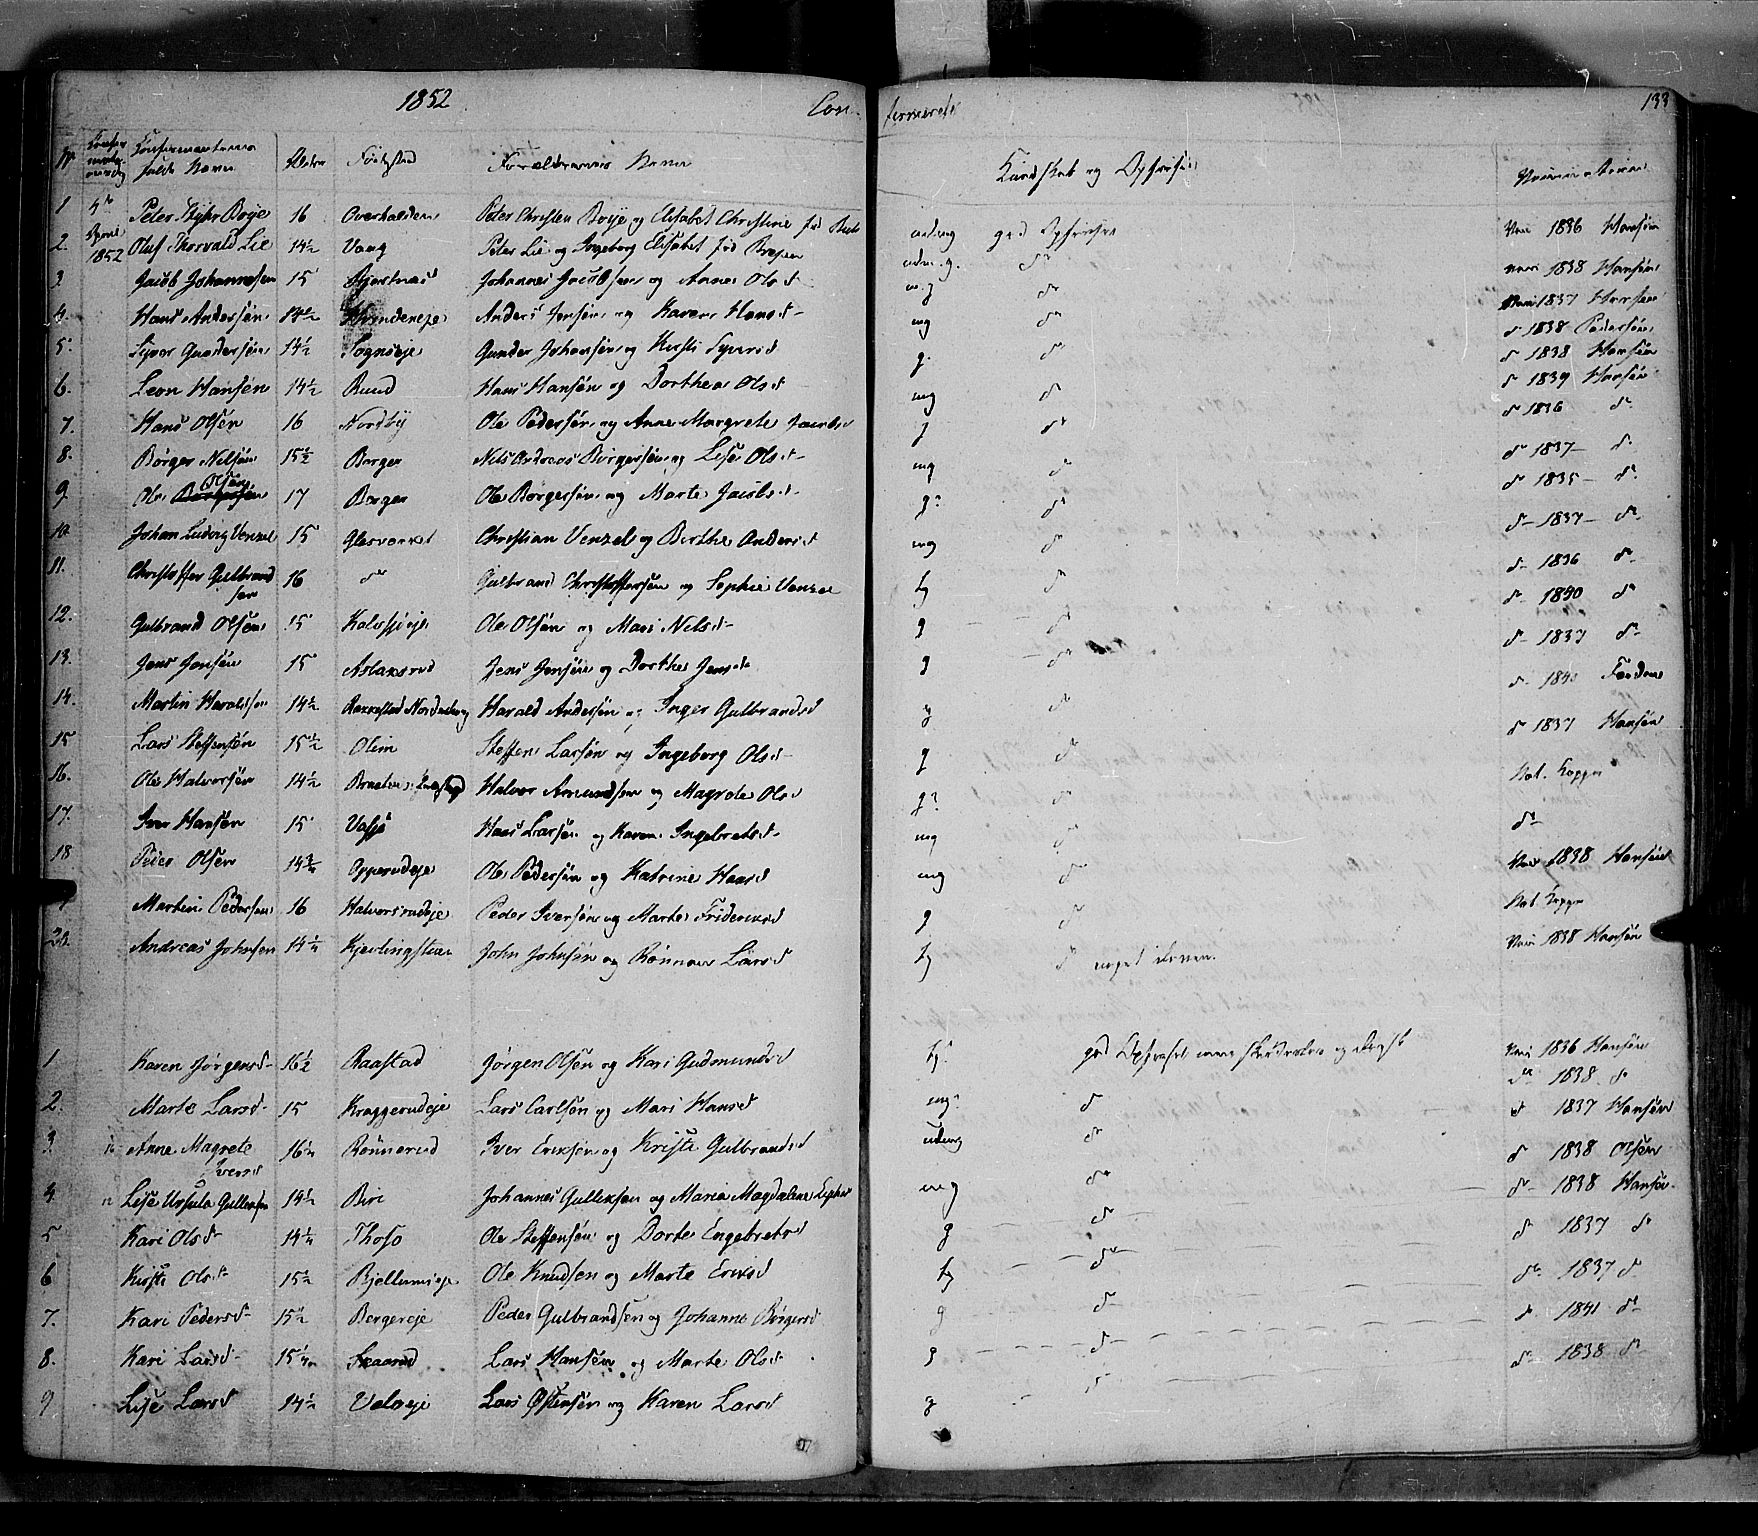 SAH, Jevnaker prestekontor, Ministerialbok nr. 6, 1837-1857, s. 133